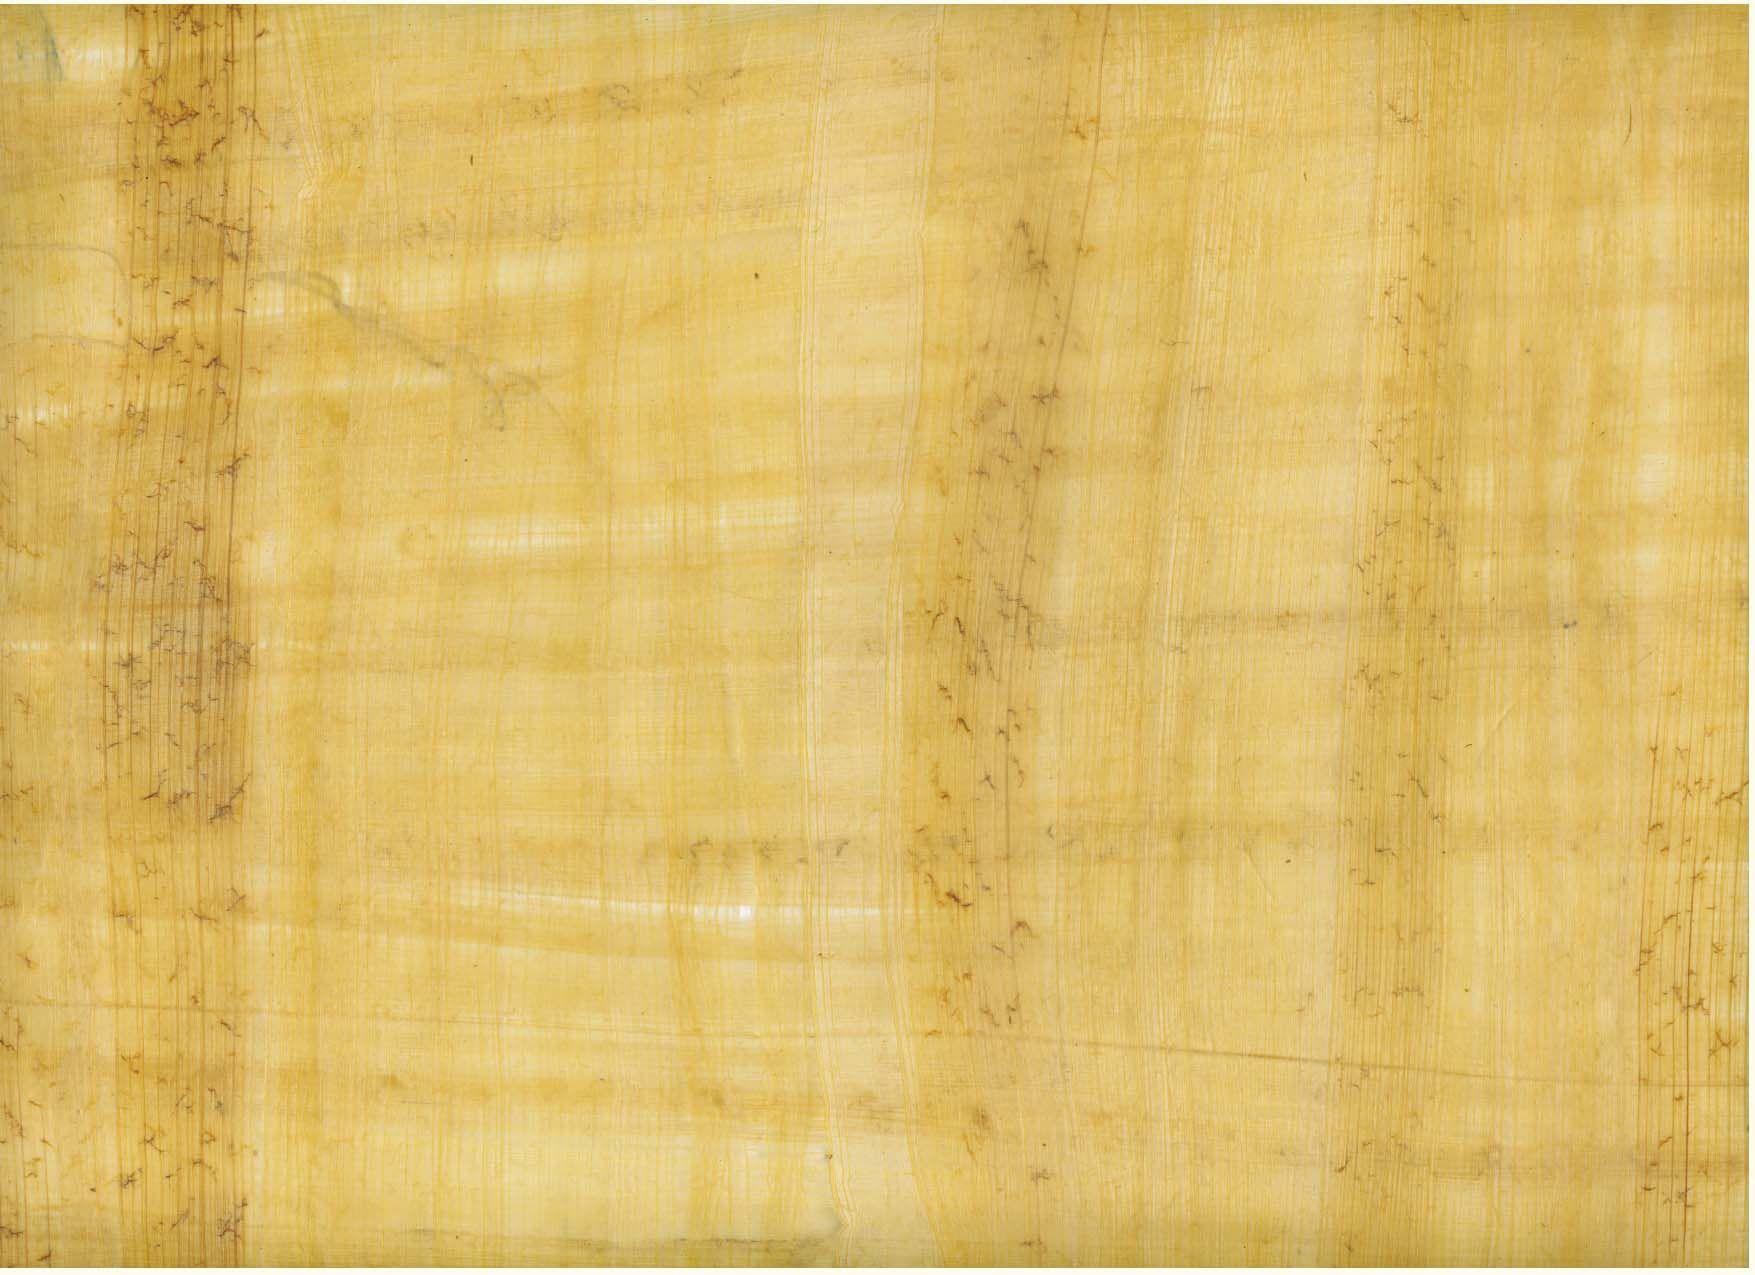 papyrus paper - Bing Images